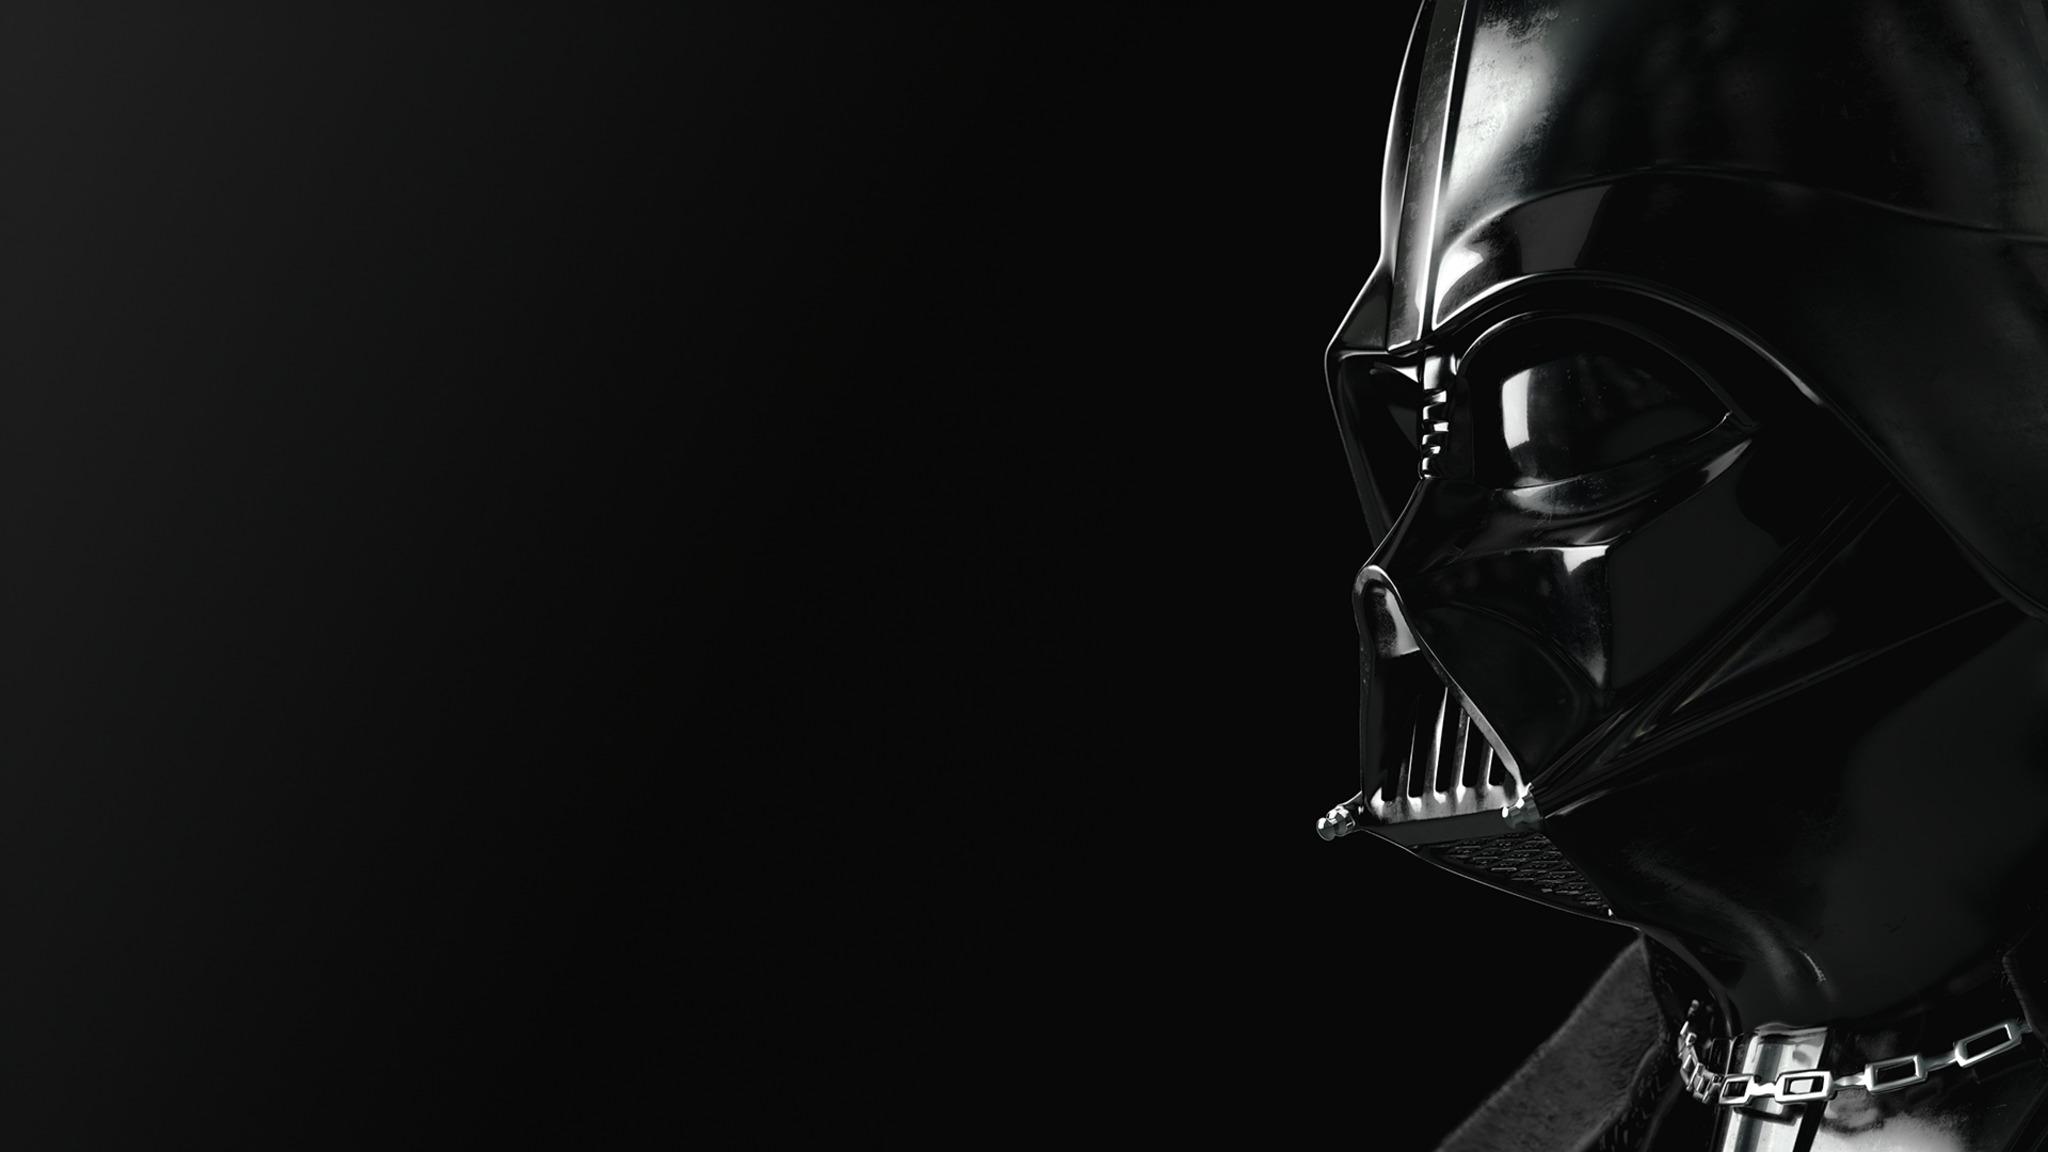 2048x1152 Star Wars Episode Vii The Force Awakens 2048x1152